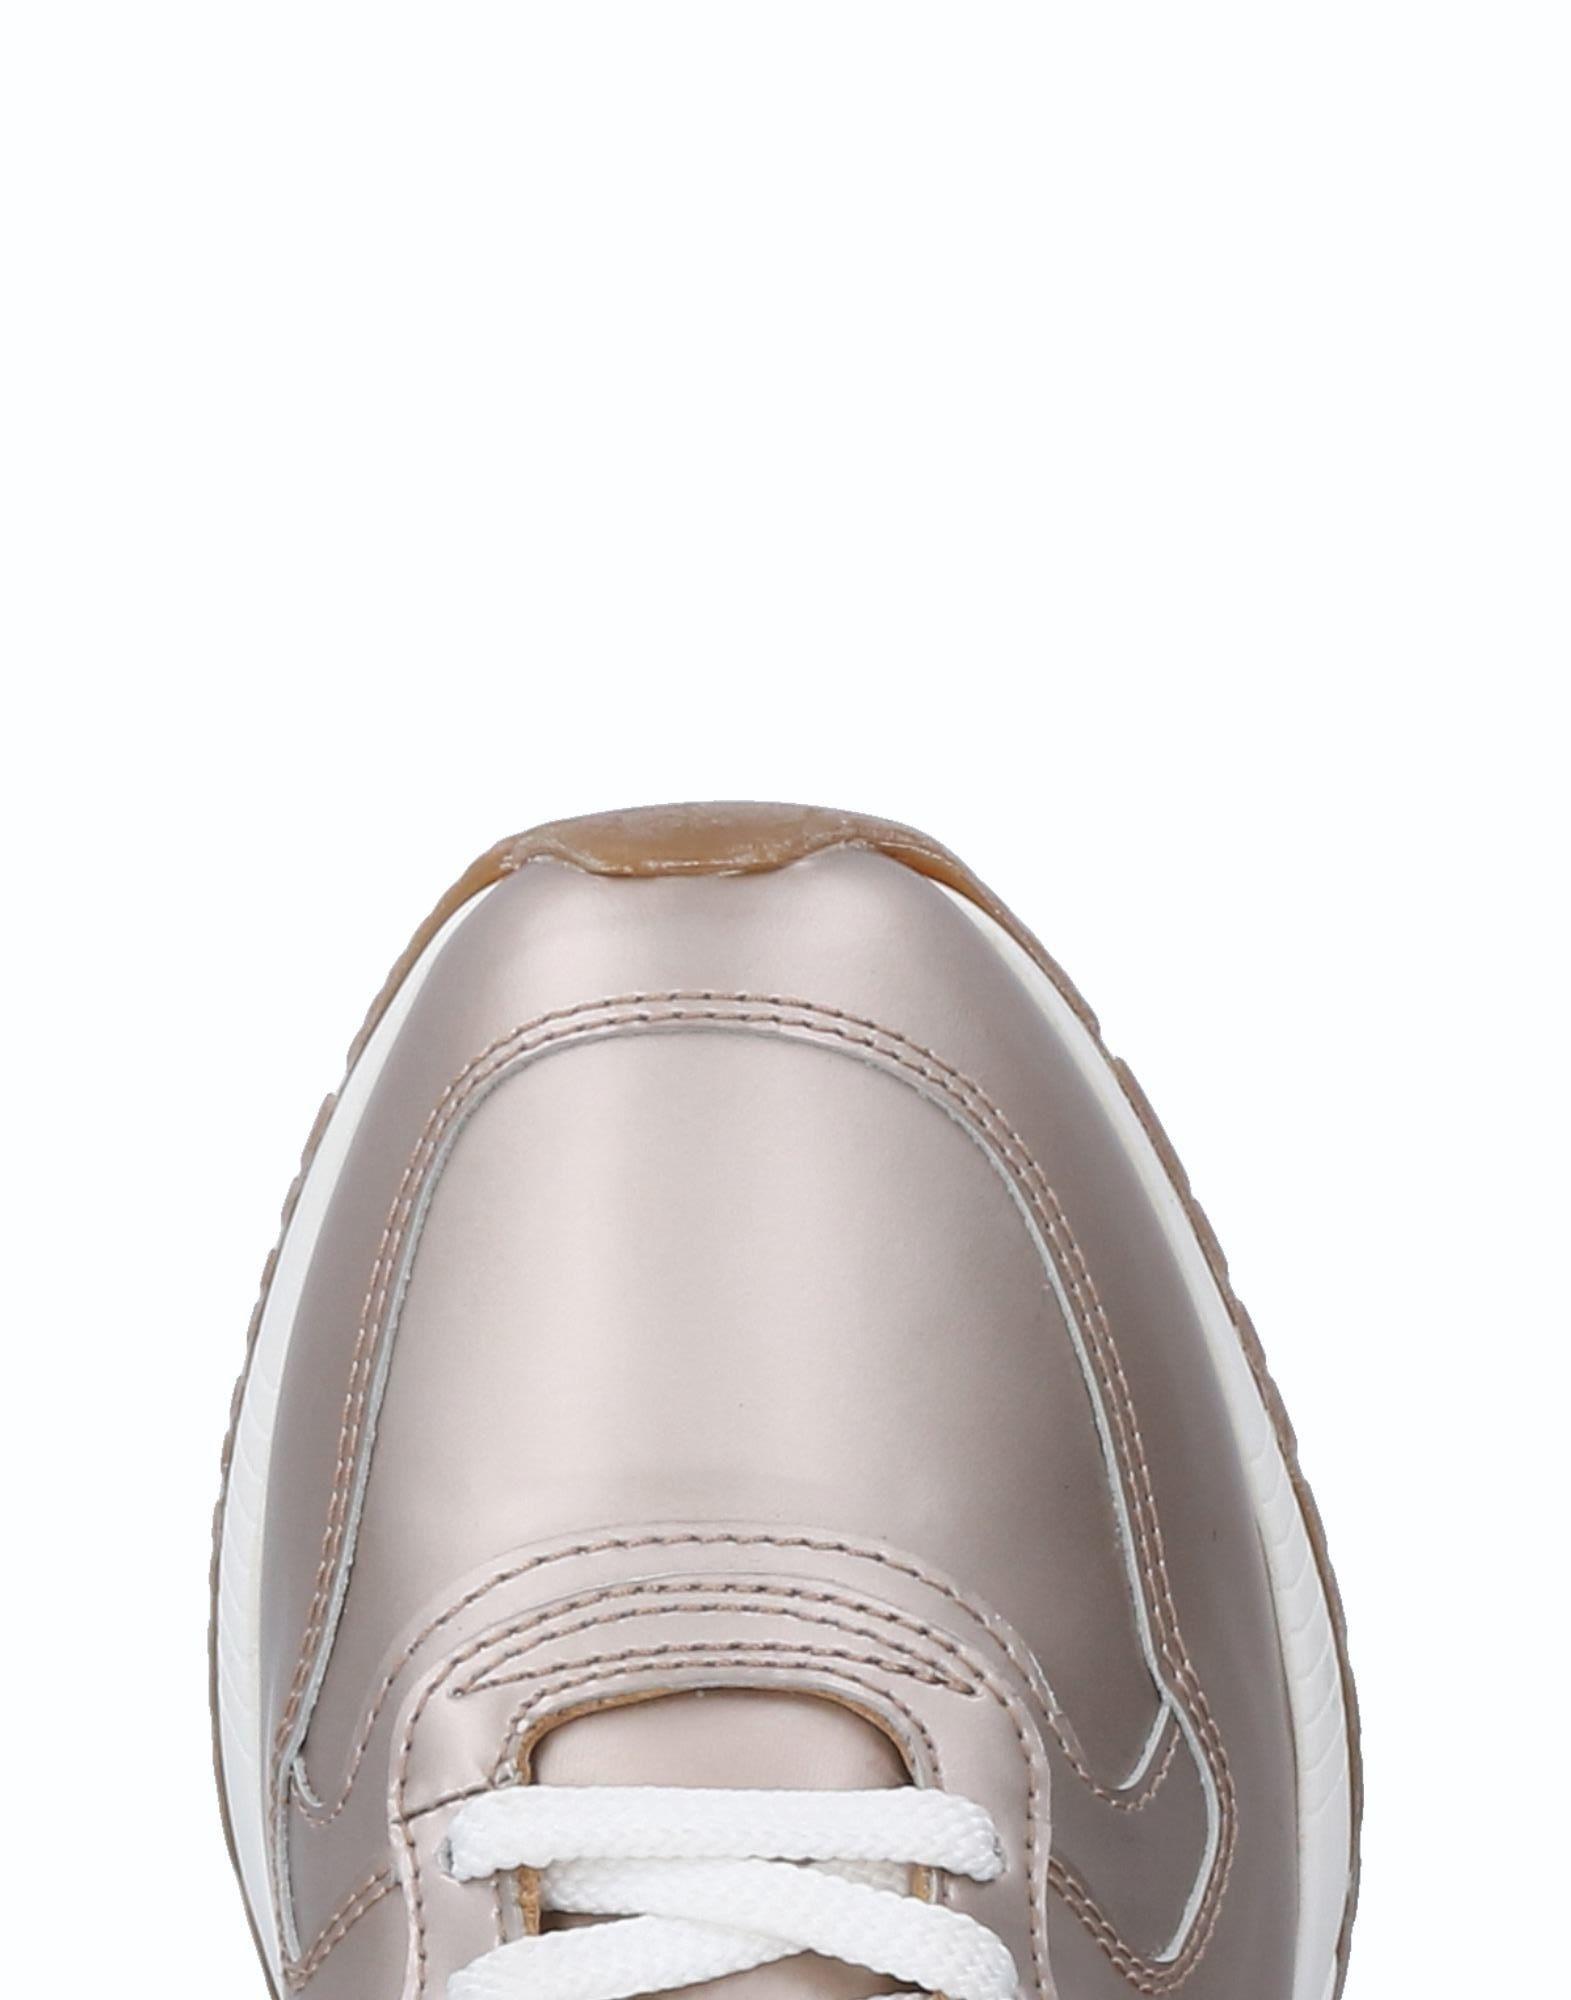 Cesare Paciotti 4Us Sneakers Neue Damen  11510470LW Neue Sneakers Schuhe 848d2c